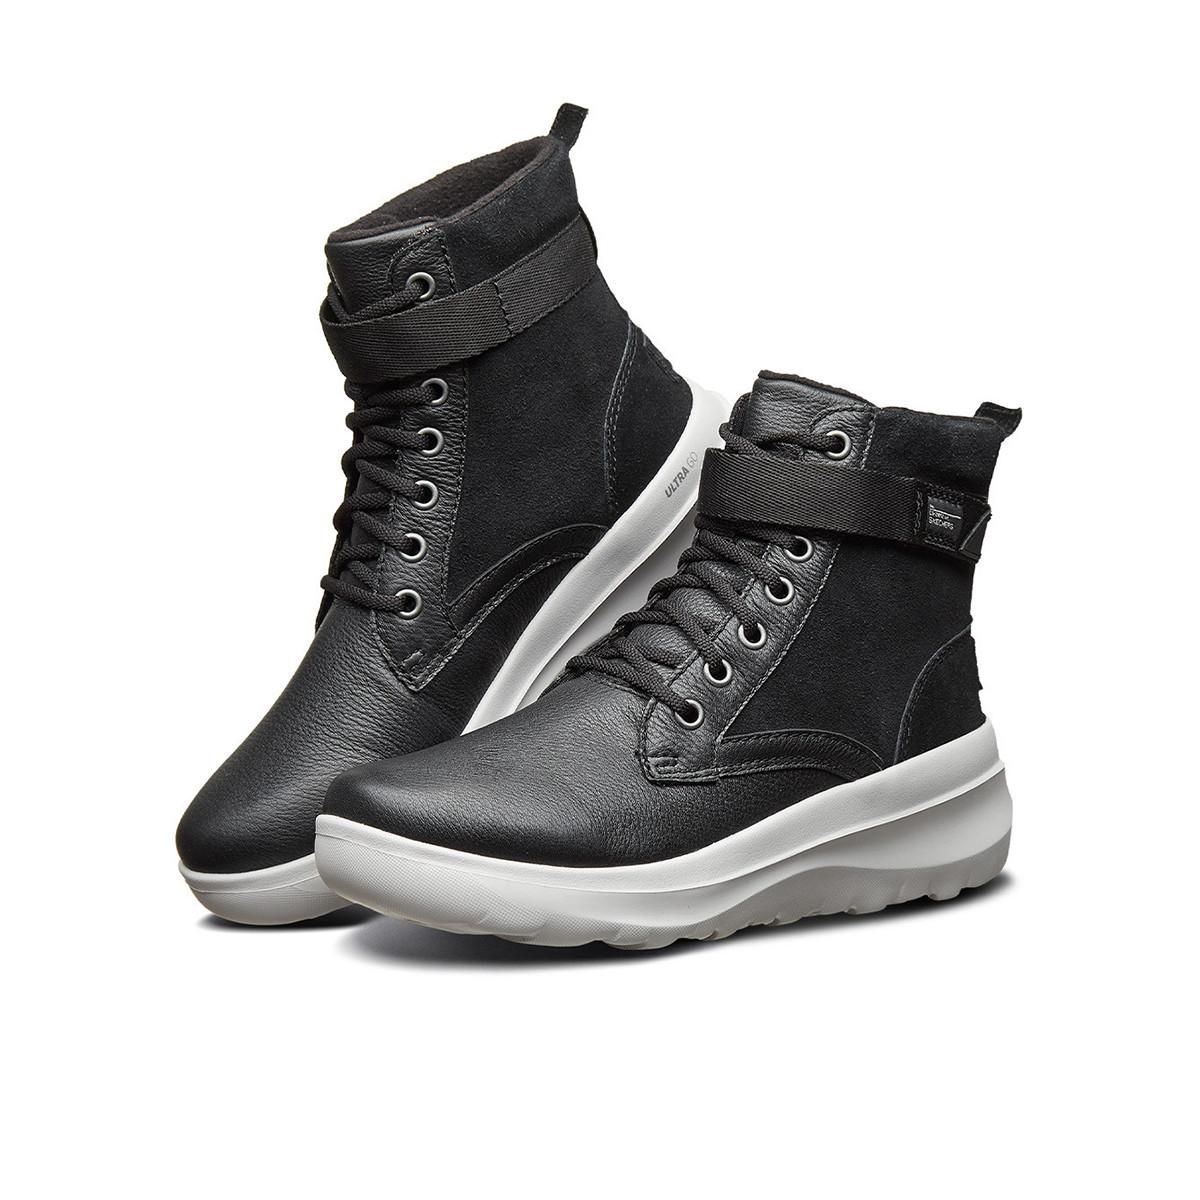 SKECHERS 斯凯奇 ON THE GO系列 女子户外休闲鞋 15546-BKGY 黑灰 36